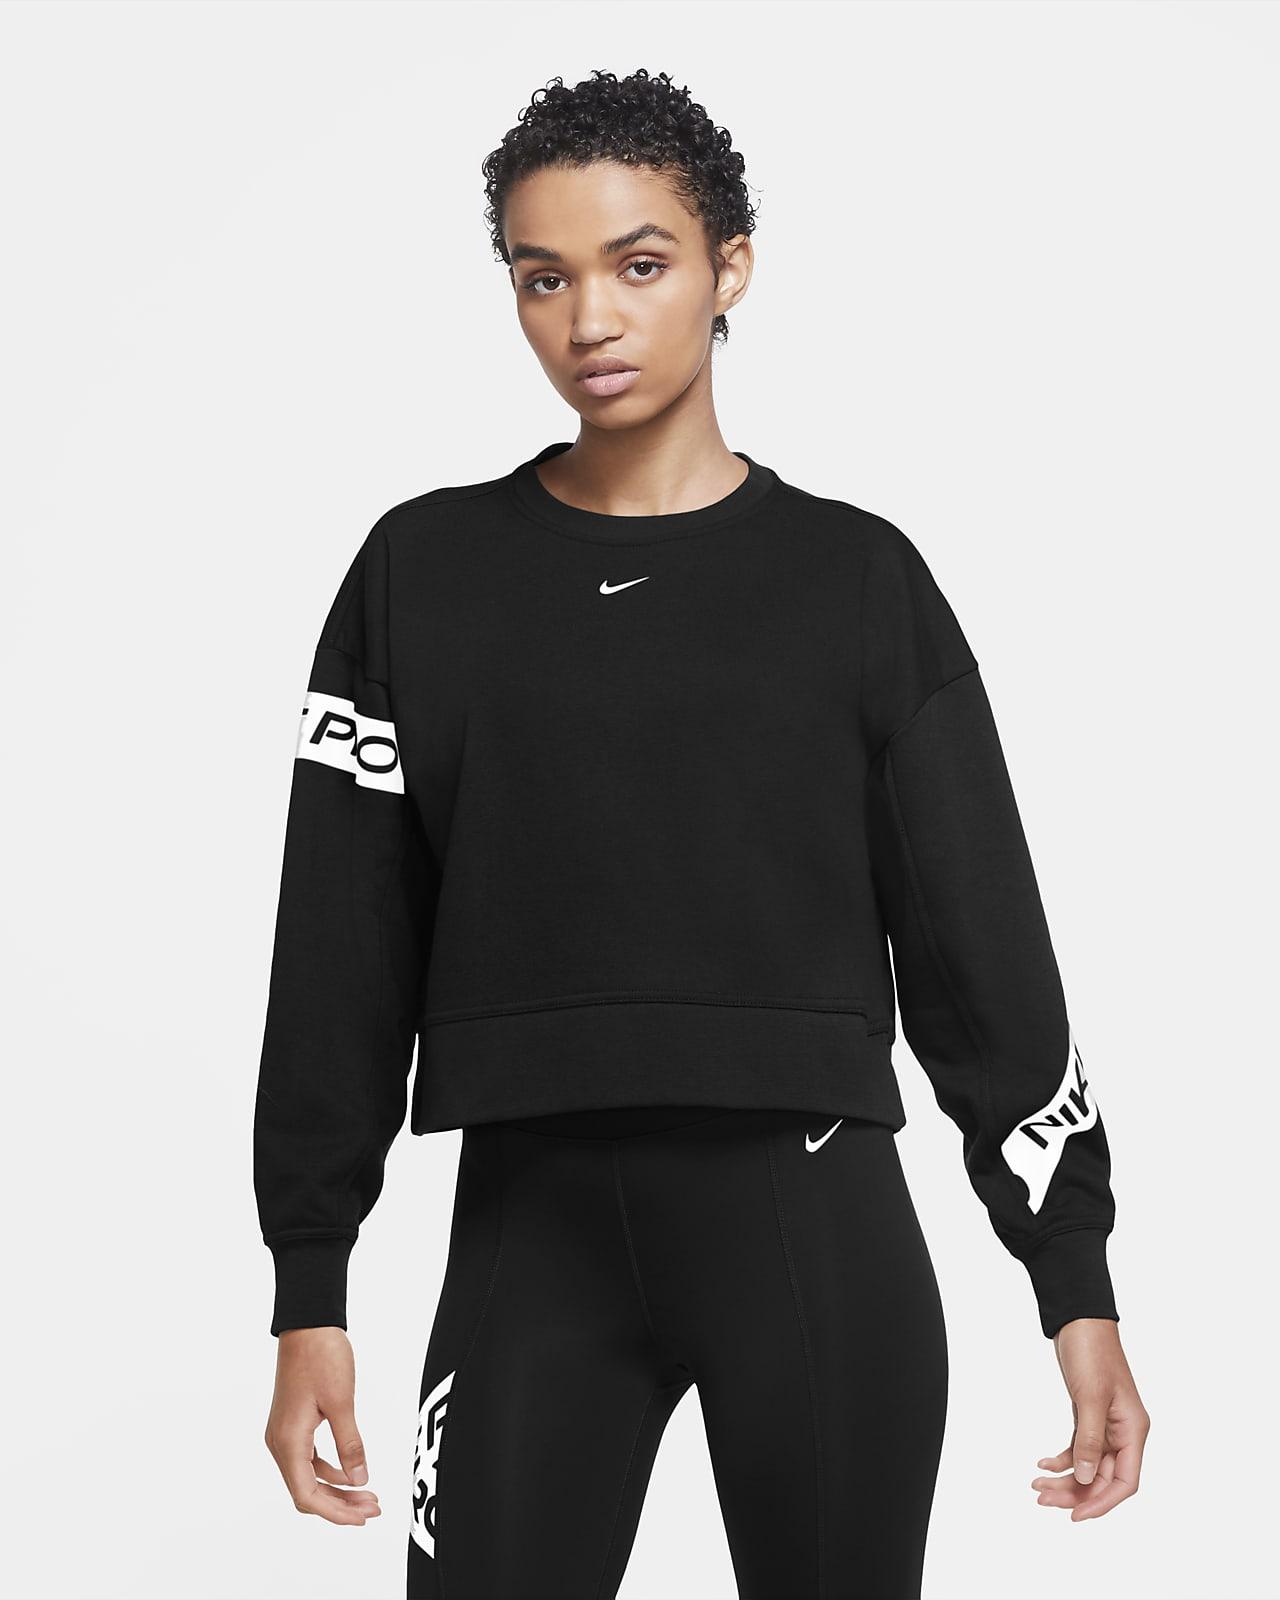 caligrafía Mono Determinar con precisión  Nike Pro Dri-FIT Get Fit Women's Training Crew. Nike SA